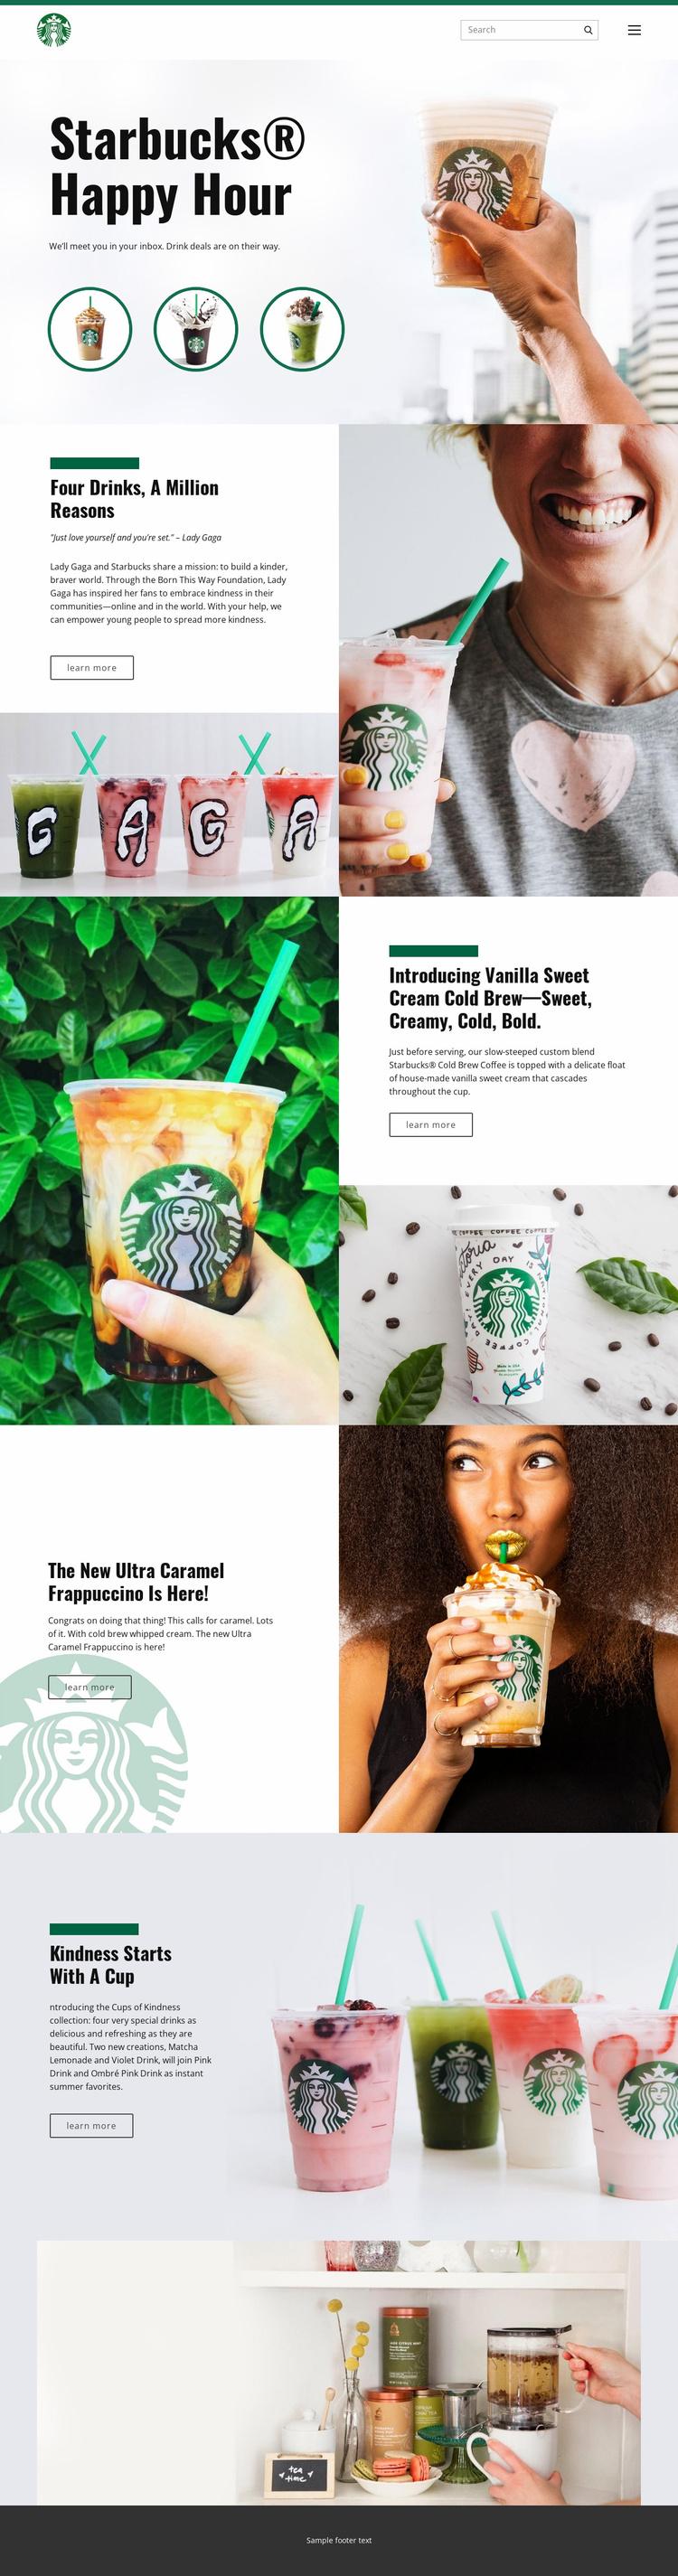 Starbucks Coffee Website Template